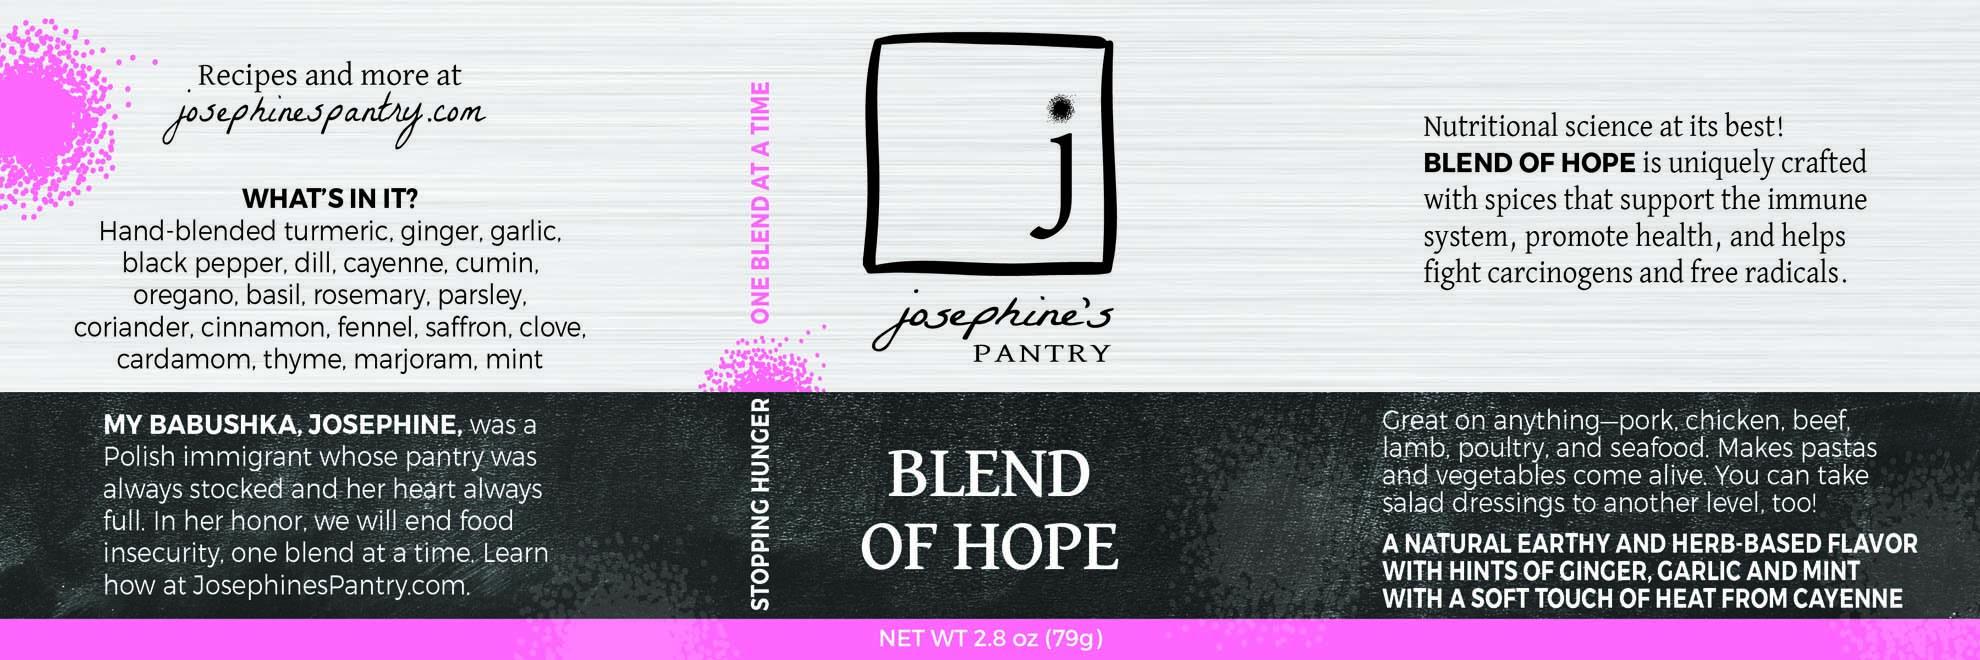 Josephines Pantry Blend of Hope.jpg